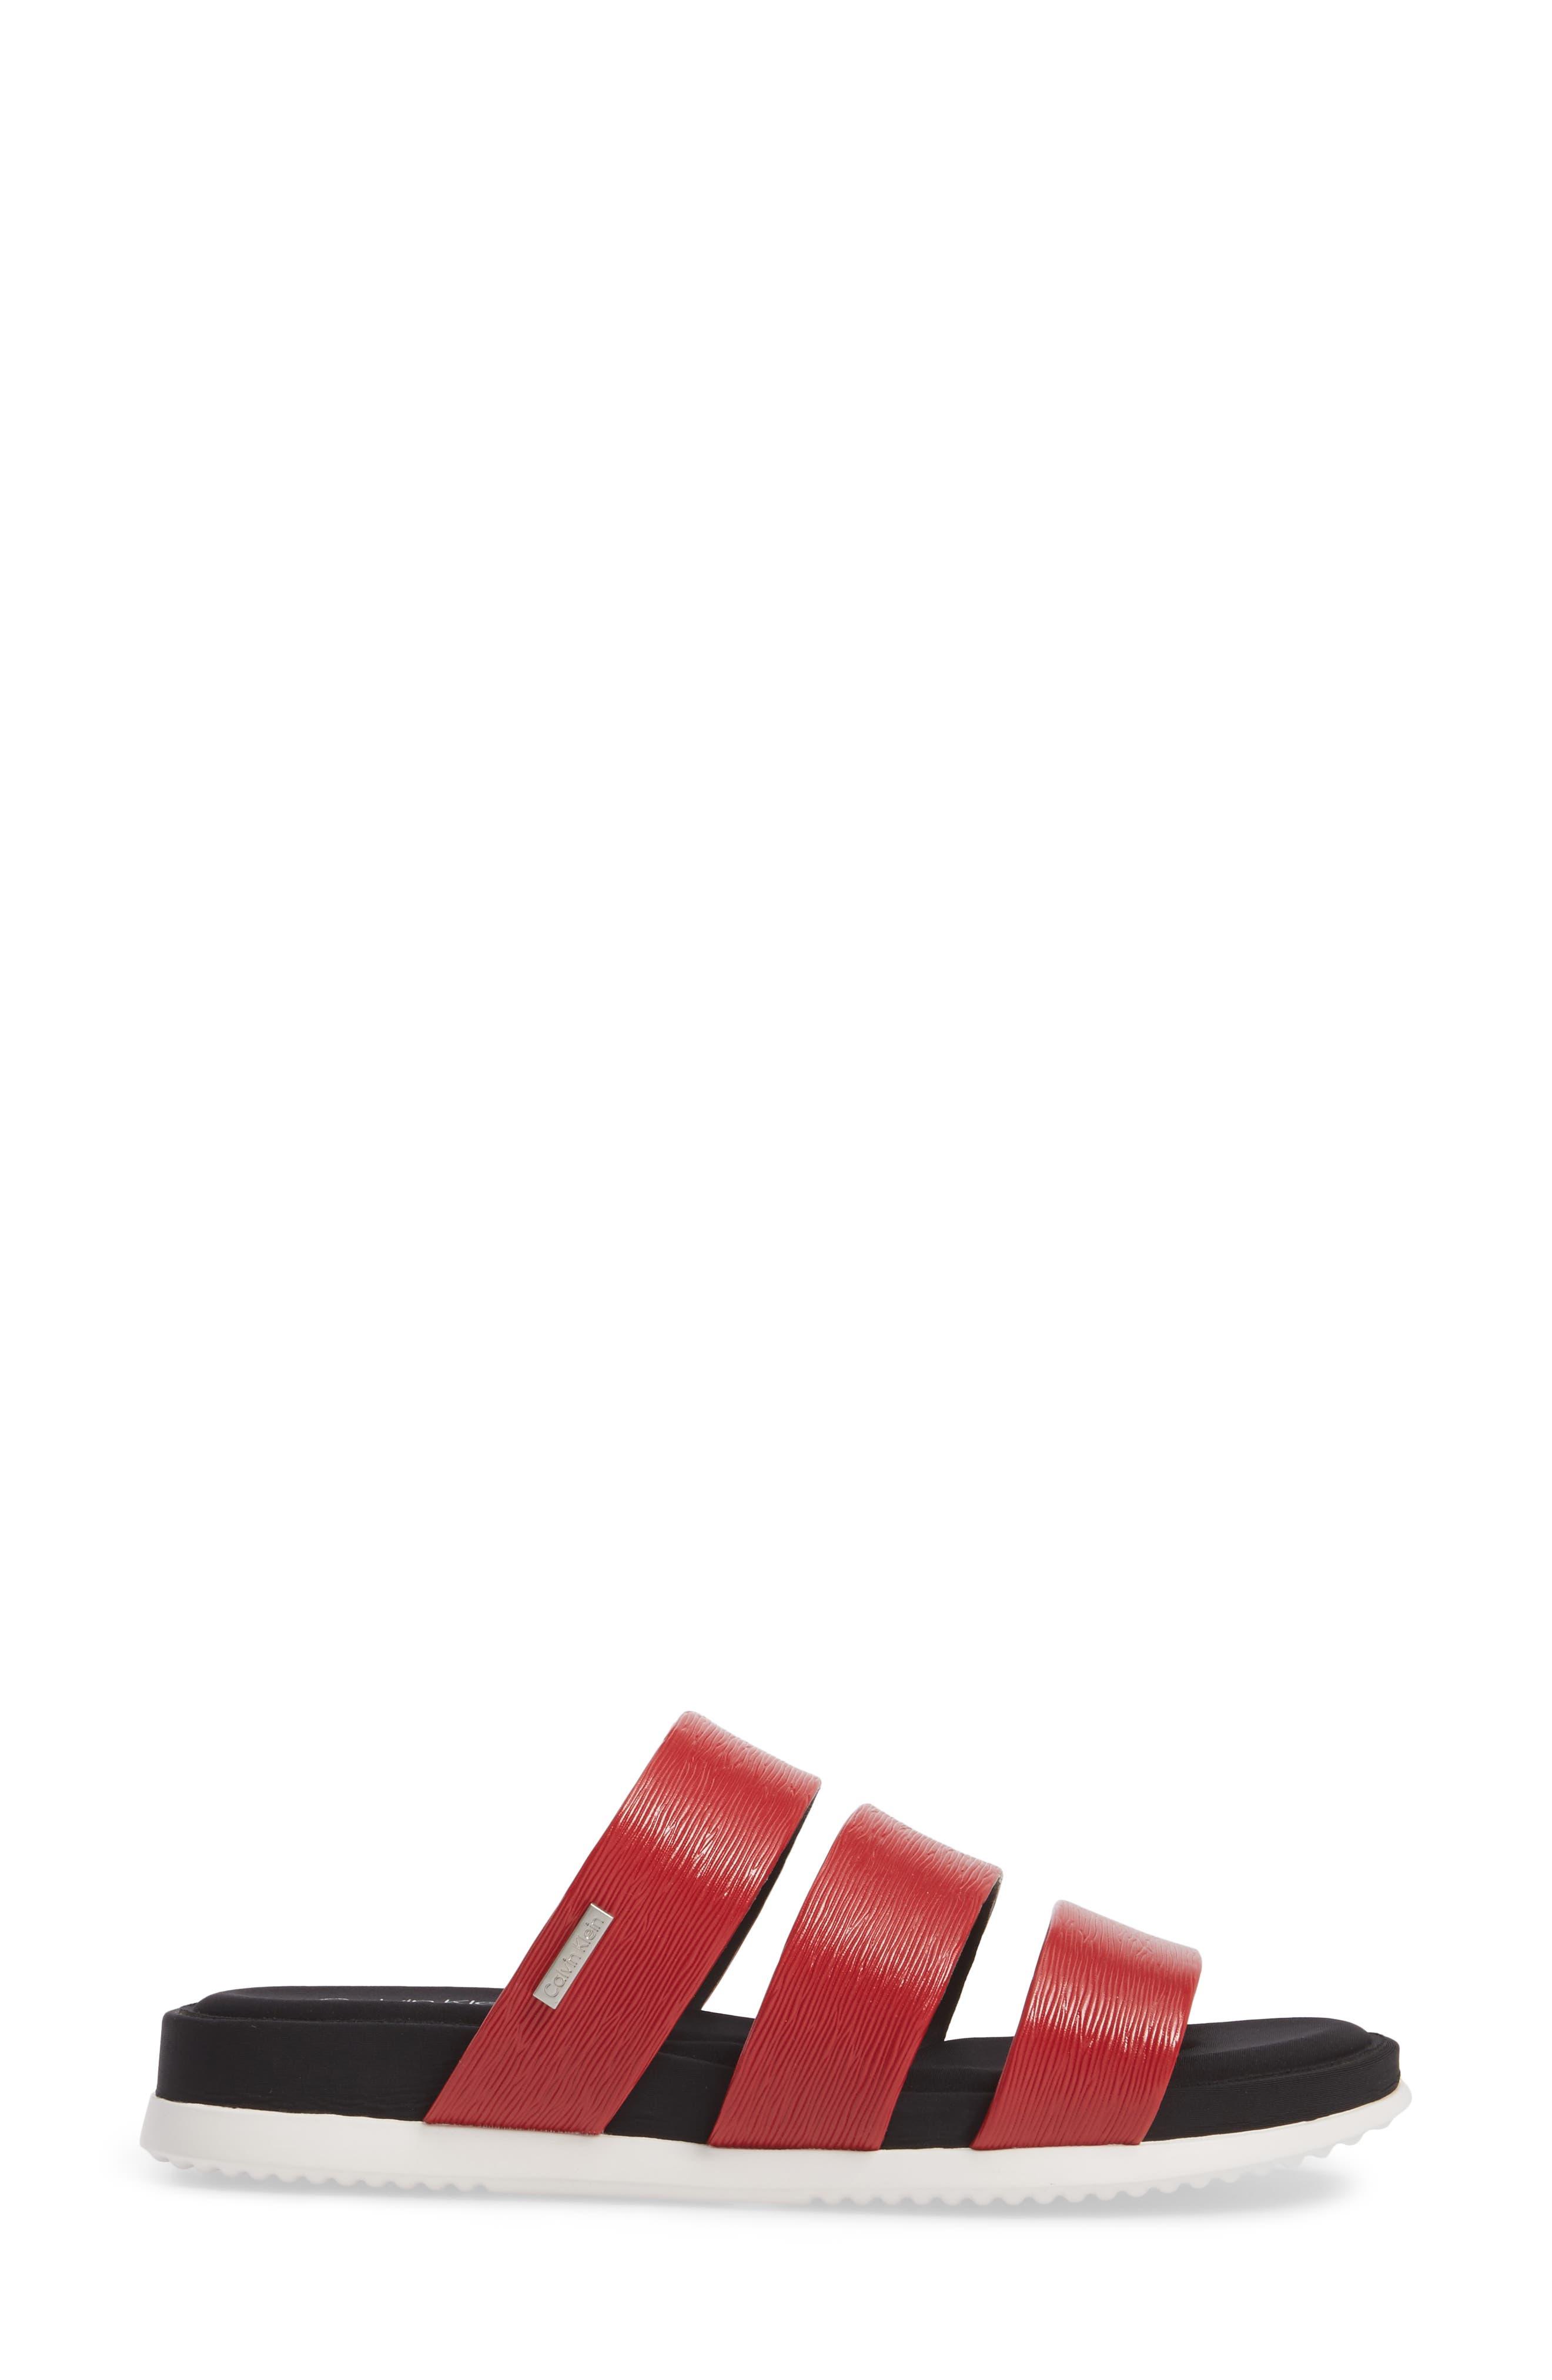 Dalana Slide Sandal,                             Alternate thumbnail 18, color,